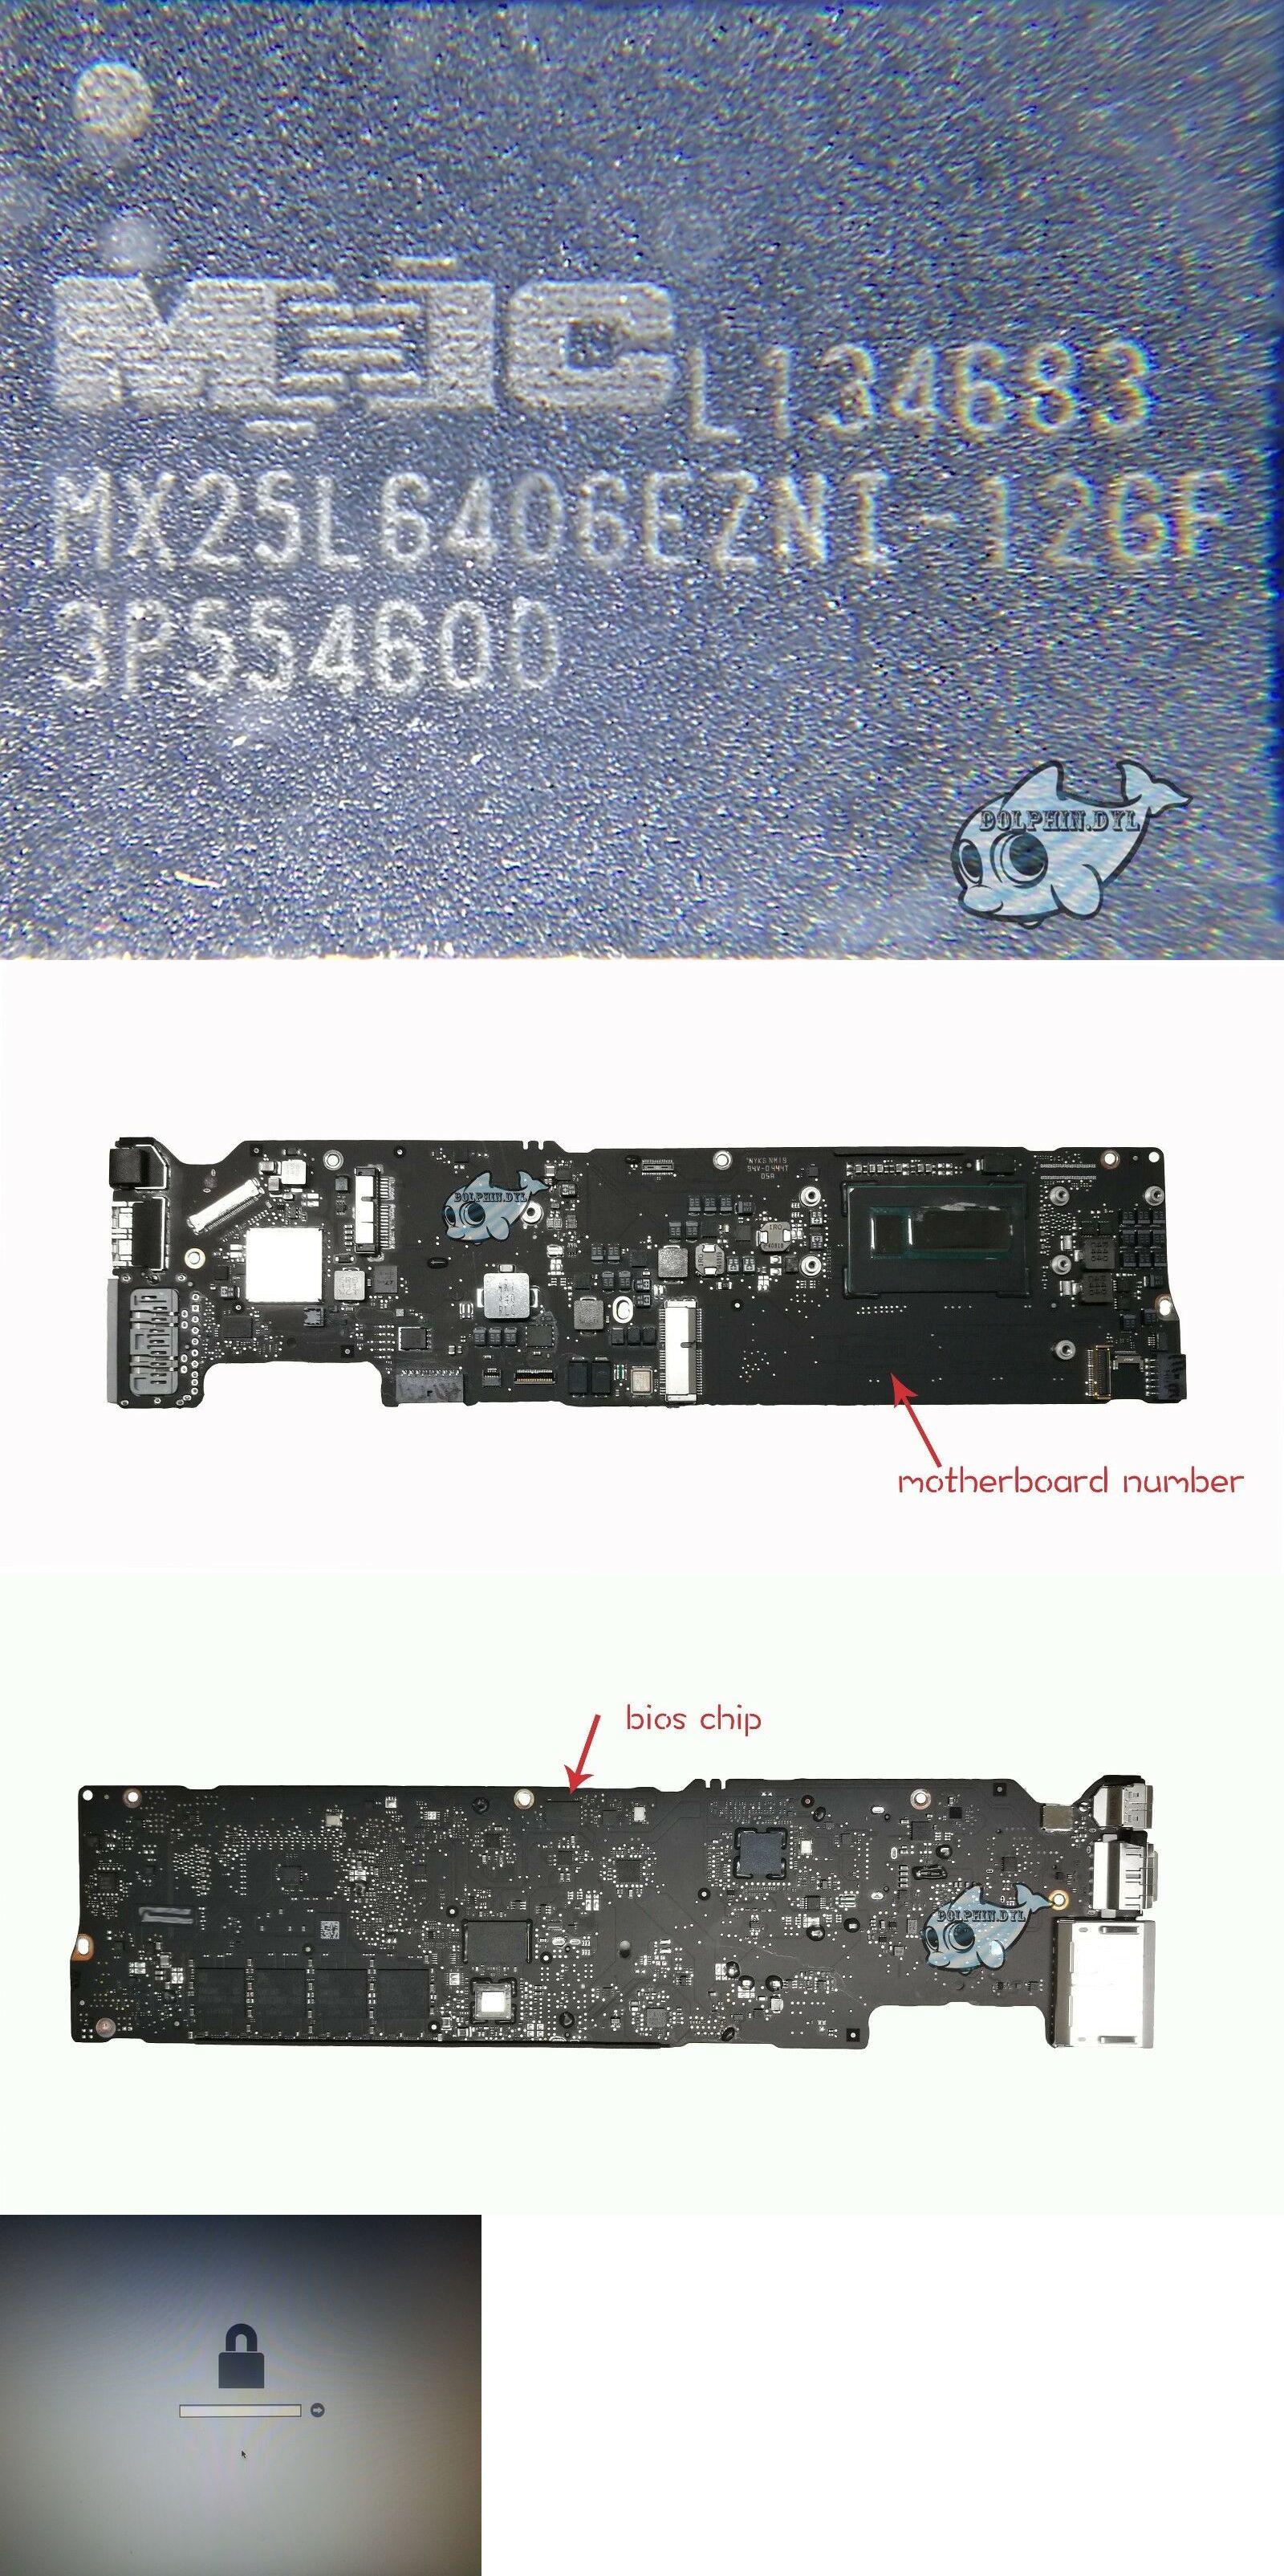 Pre Programmed Bios Efi Firmware Chip For Macbook Air A1466 820 3437 A B 2014 Macbook Air Macbook Firmware